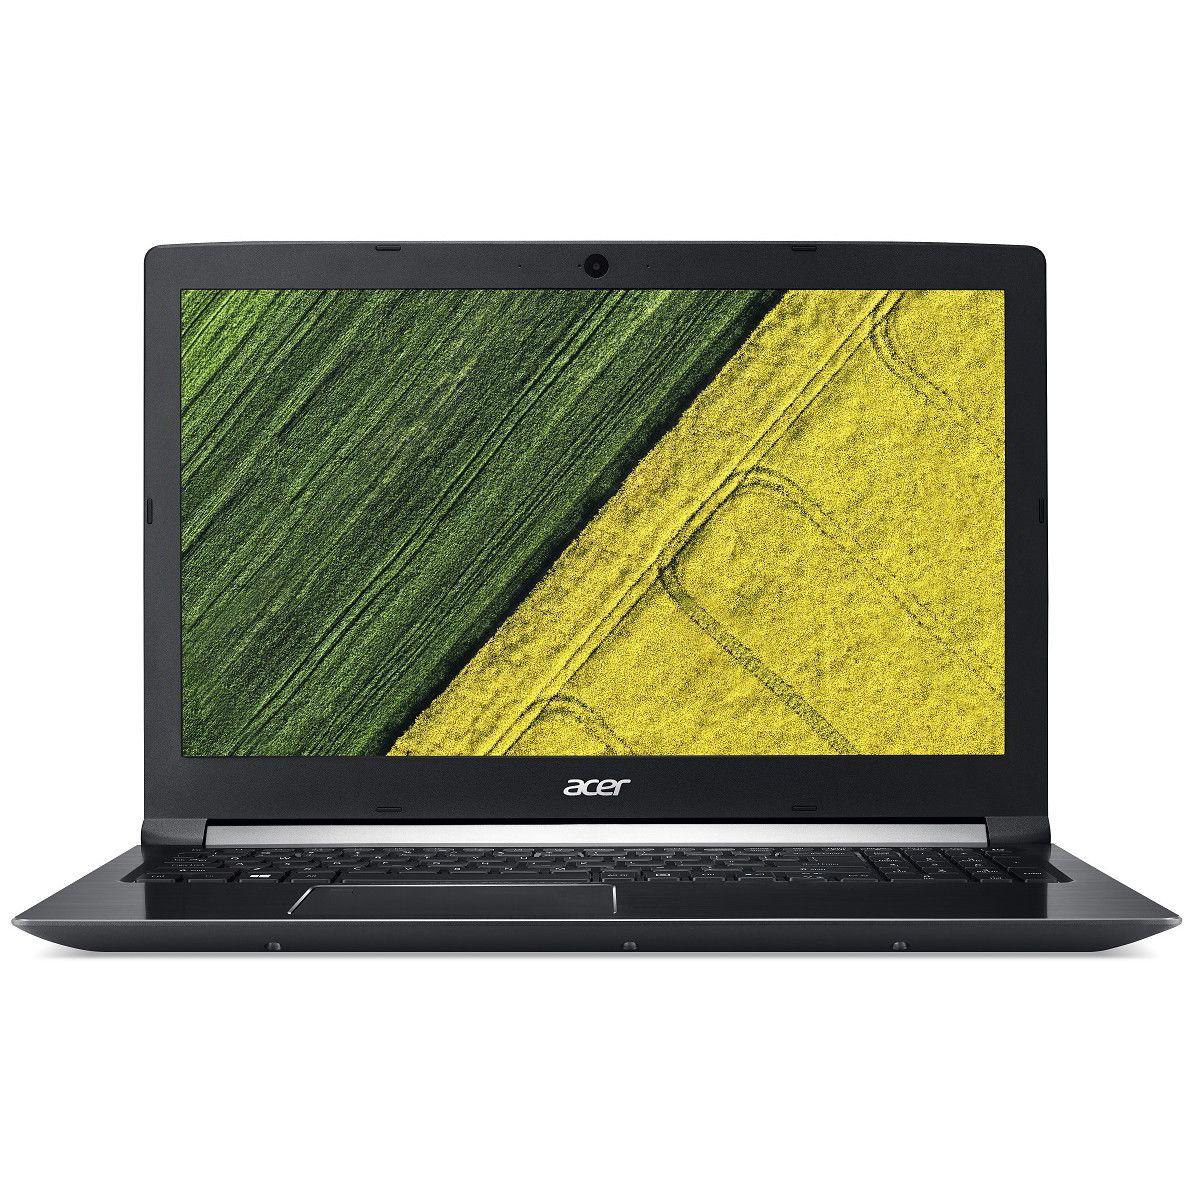 Notebook Acer Aspire A717 17.3 Full HD Intel Core i7-7700HQ GTX 1050 Ti-4GB RAM 16GB SSD 256GB Linux